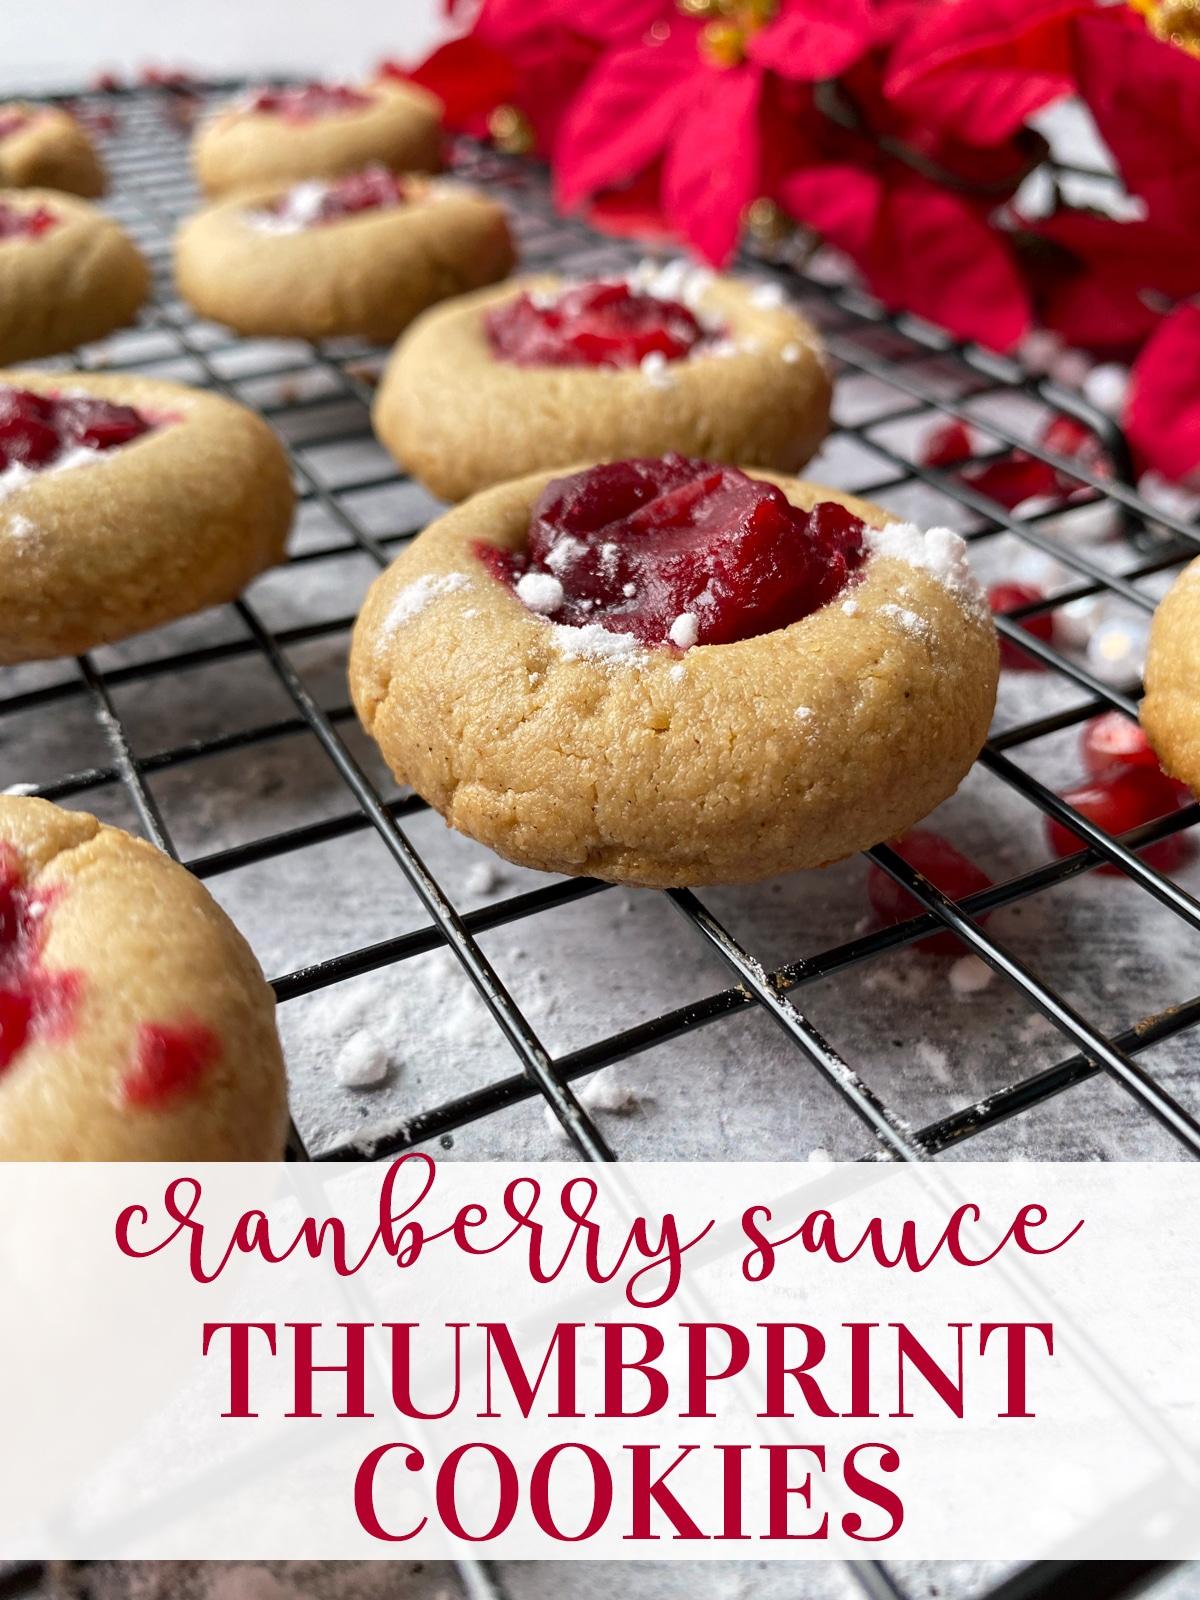 paleo-cranberry-sauce-thumbprint-cookie-recipe